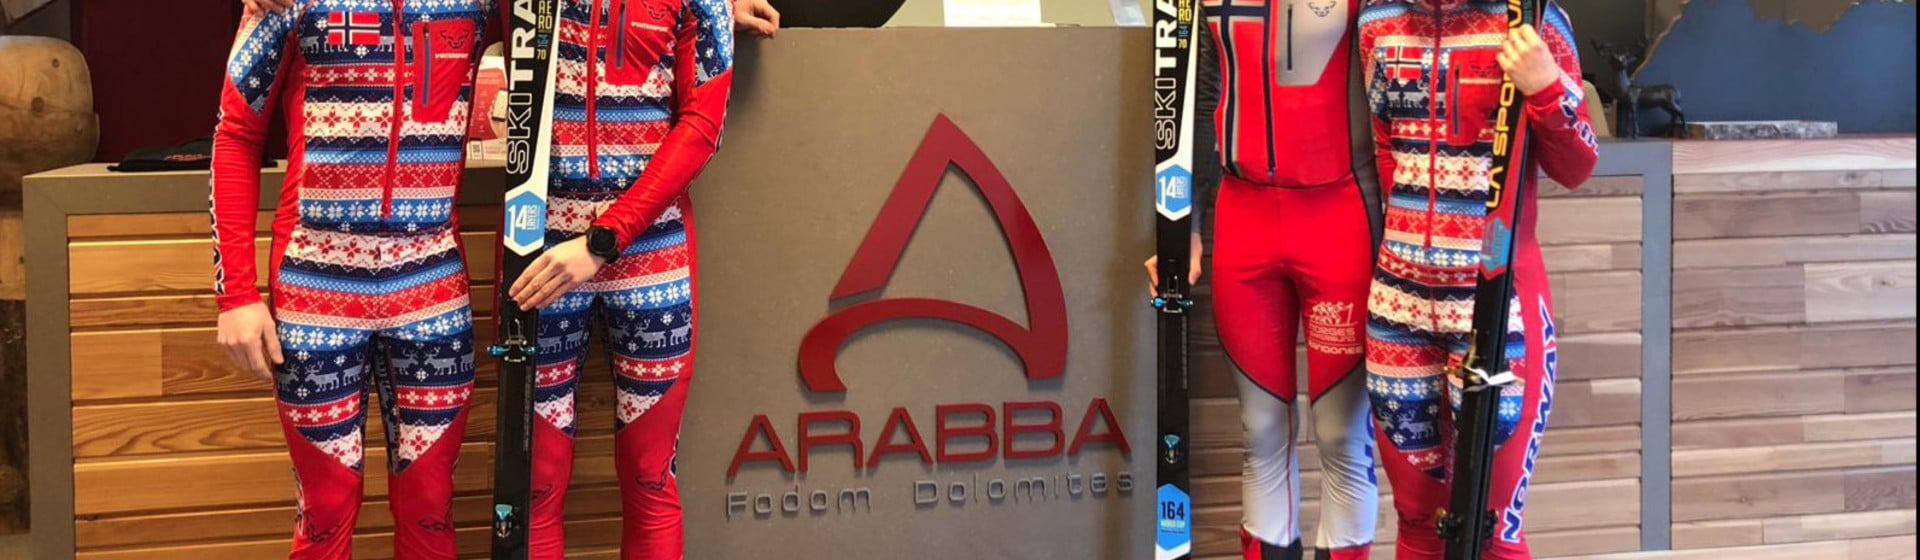 Arabba: training ground for four members of the Norwegian national ski mountaineering team